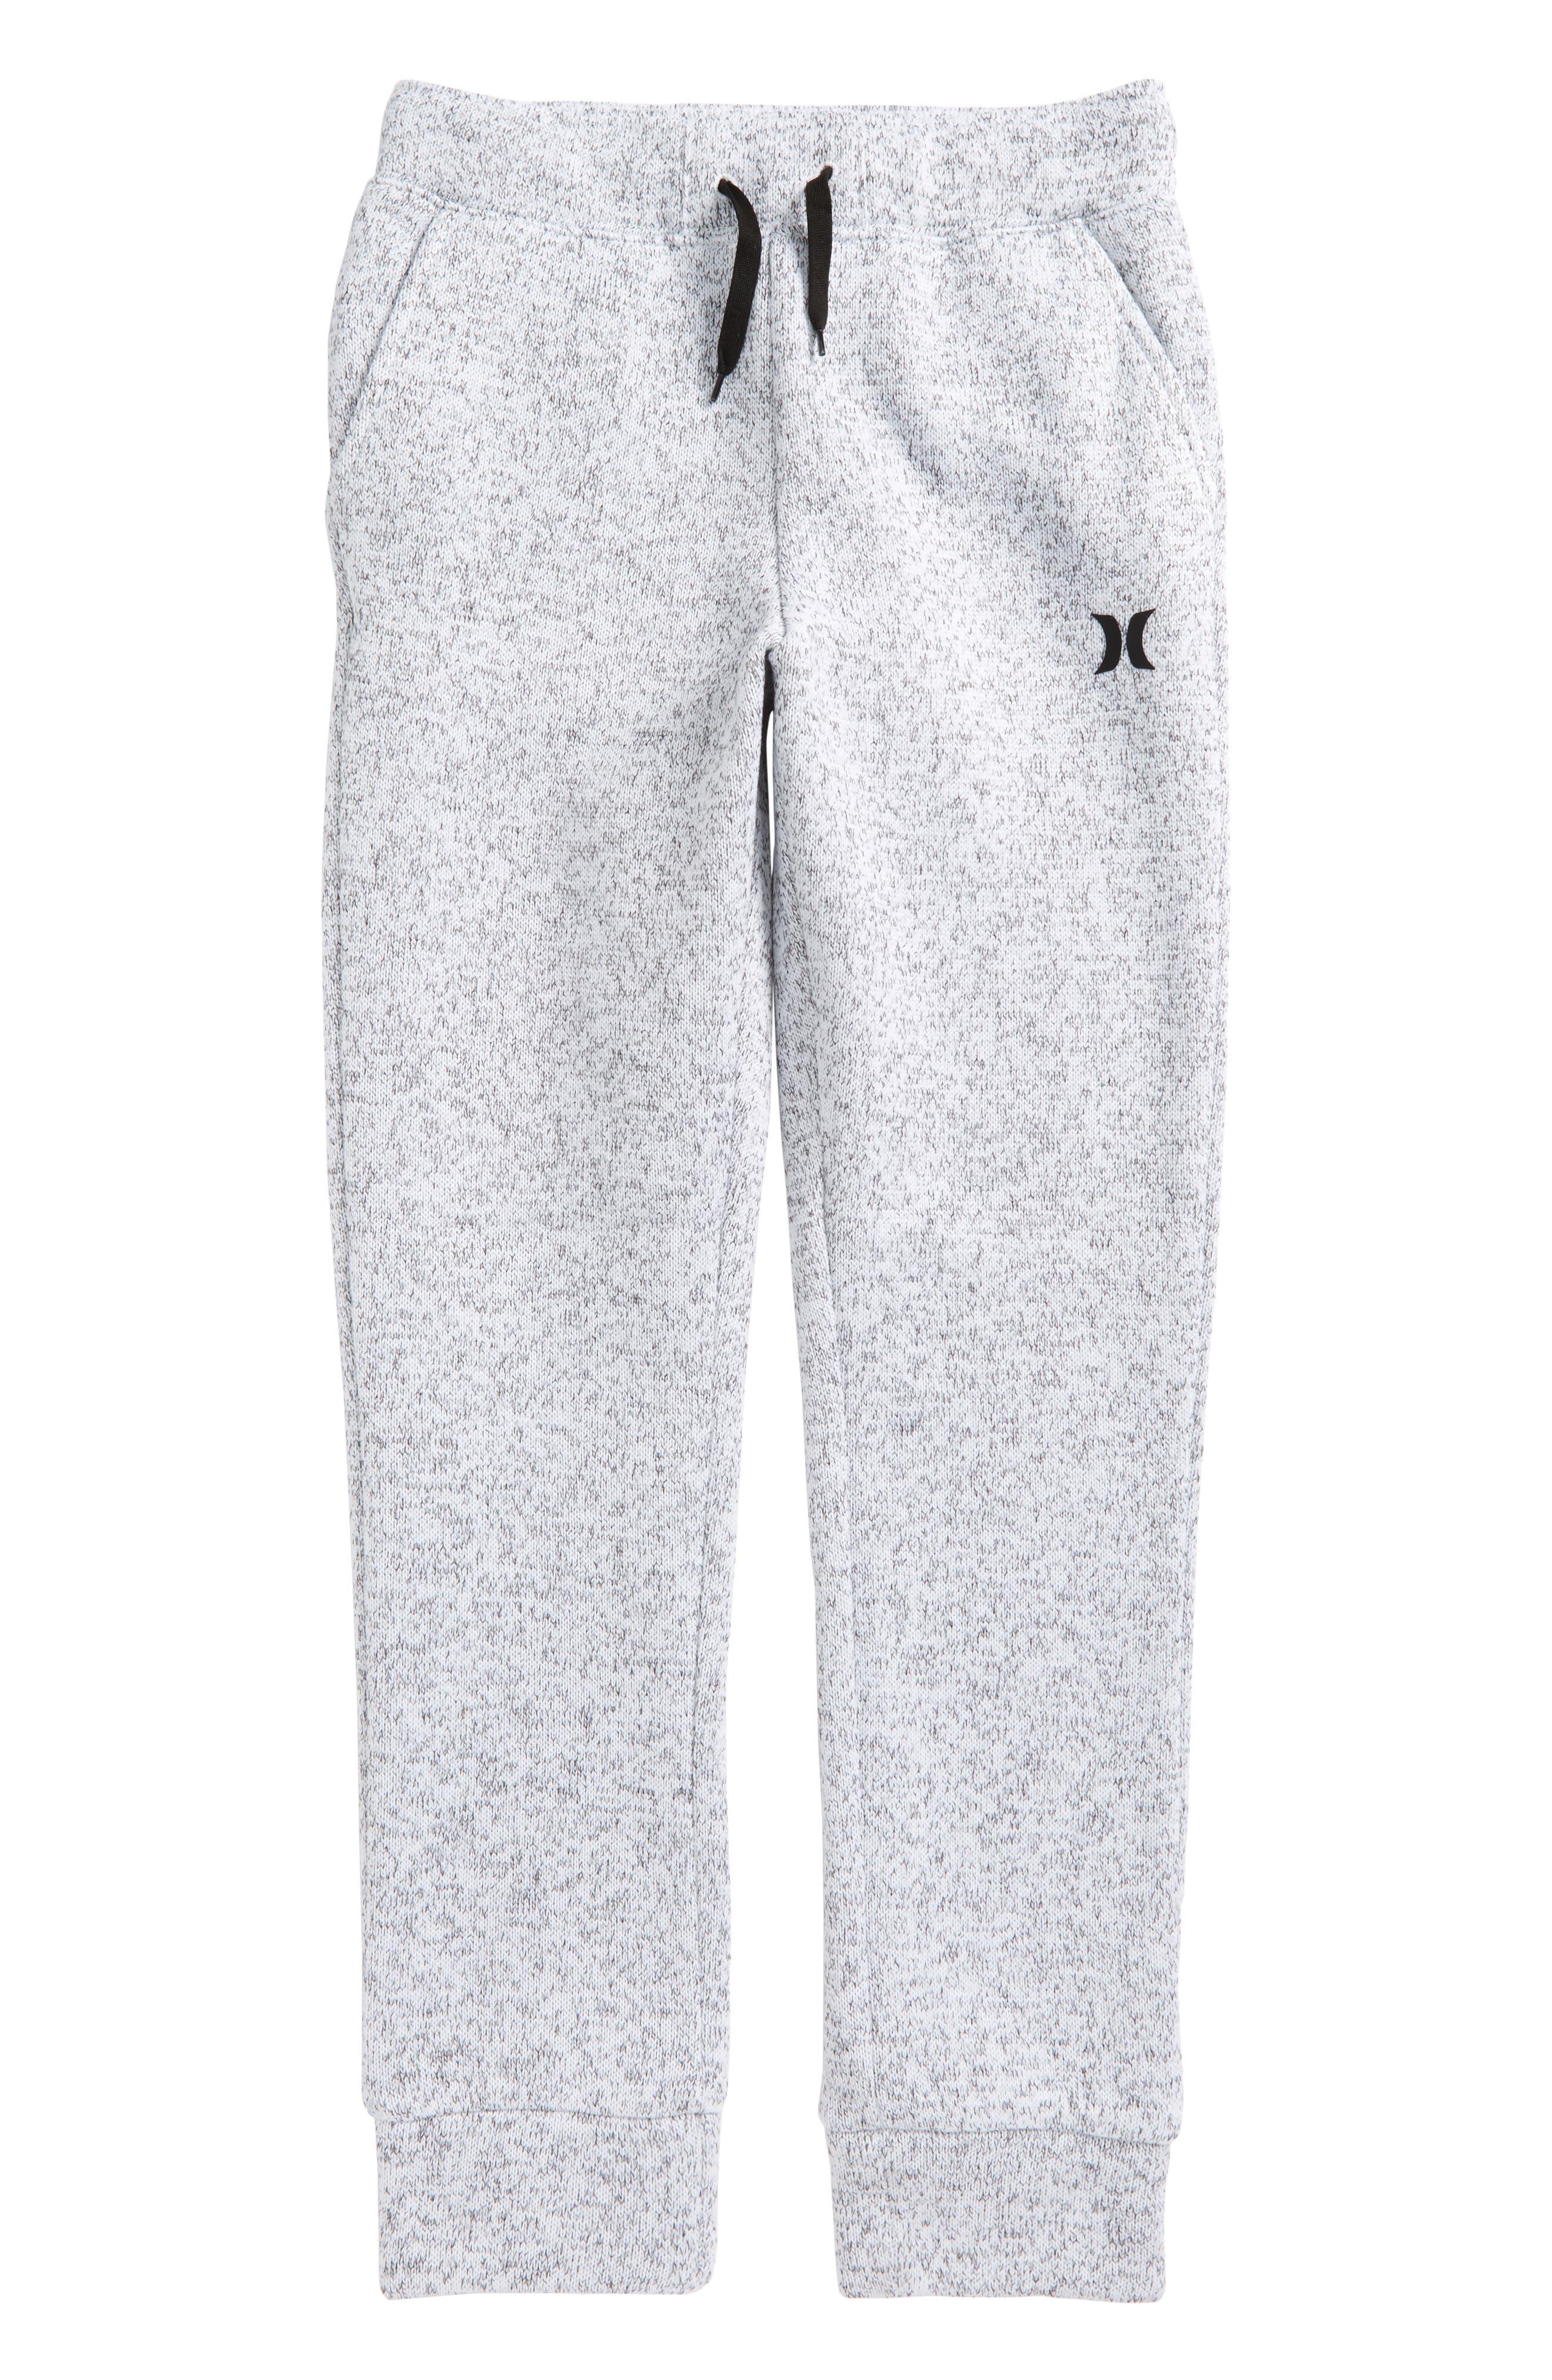 Sweater Knit Fleece Pants,                             Main thumbnail 1, color,                             White